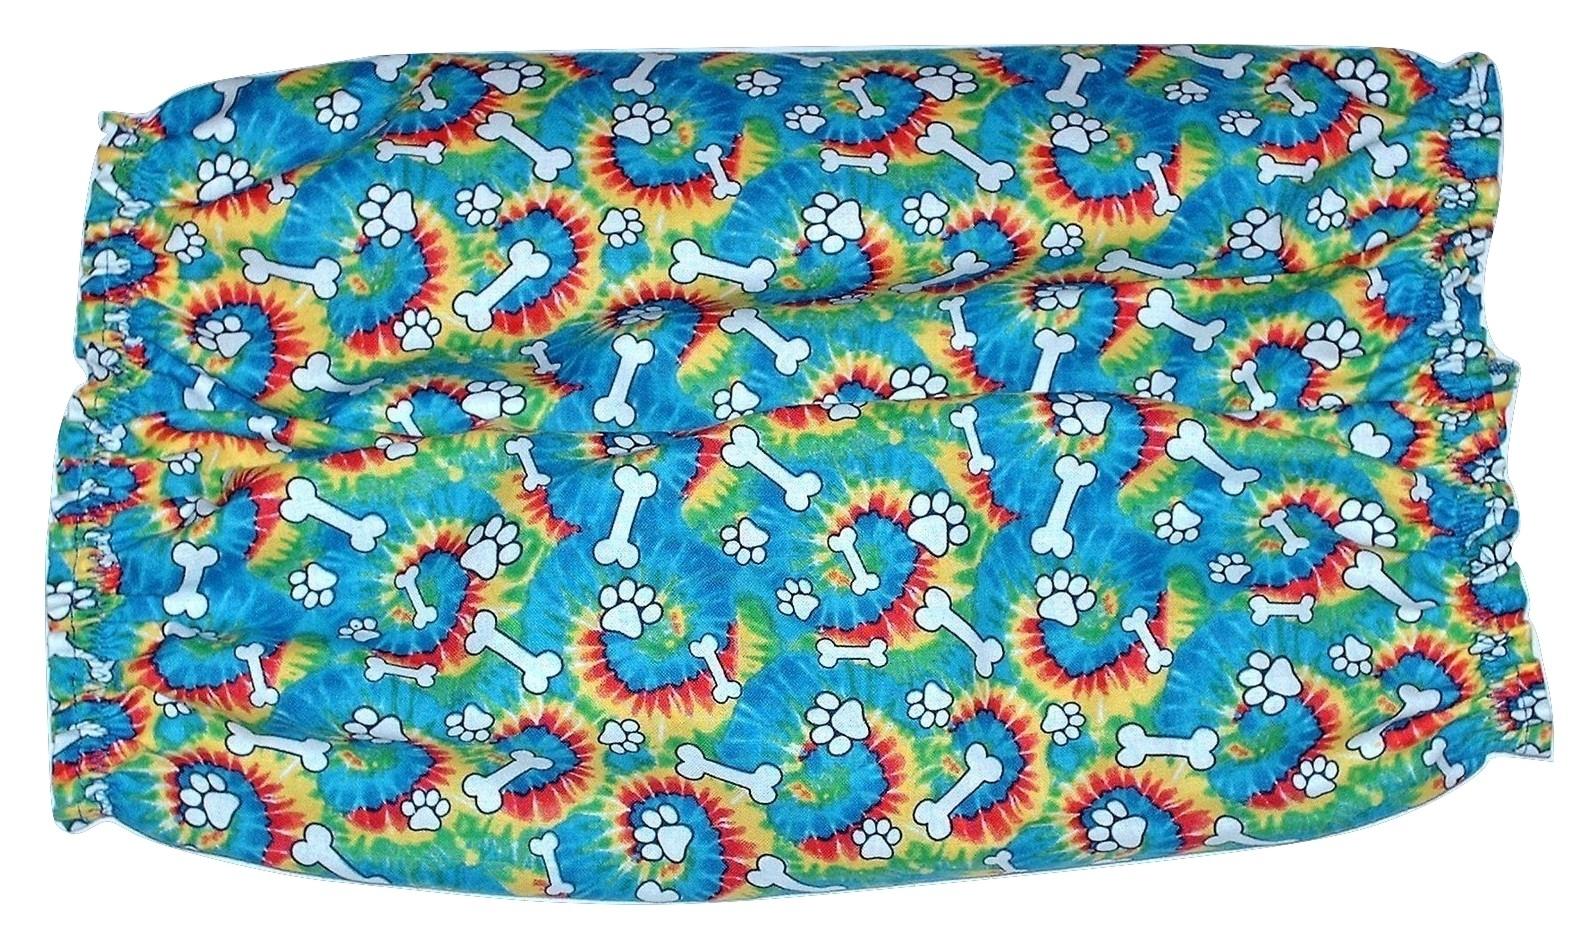 Blue Tie Dye Paw Prints Bones Cotton Dog Snood by Howlin Hounds Size XL